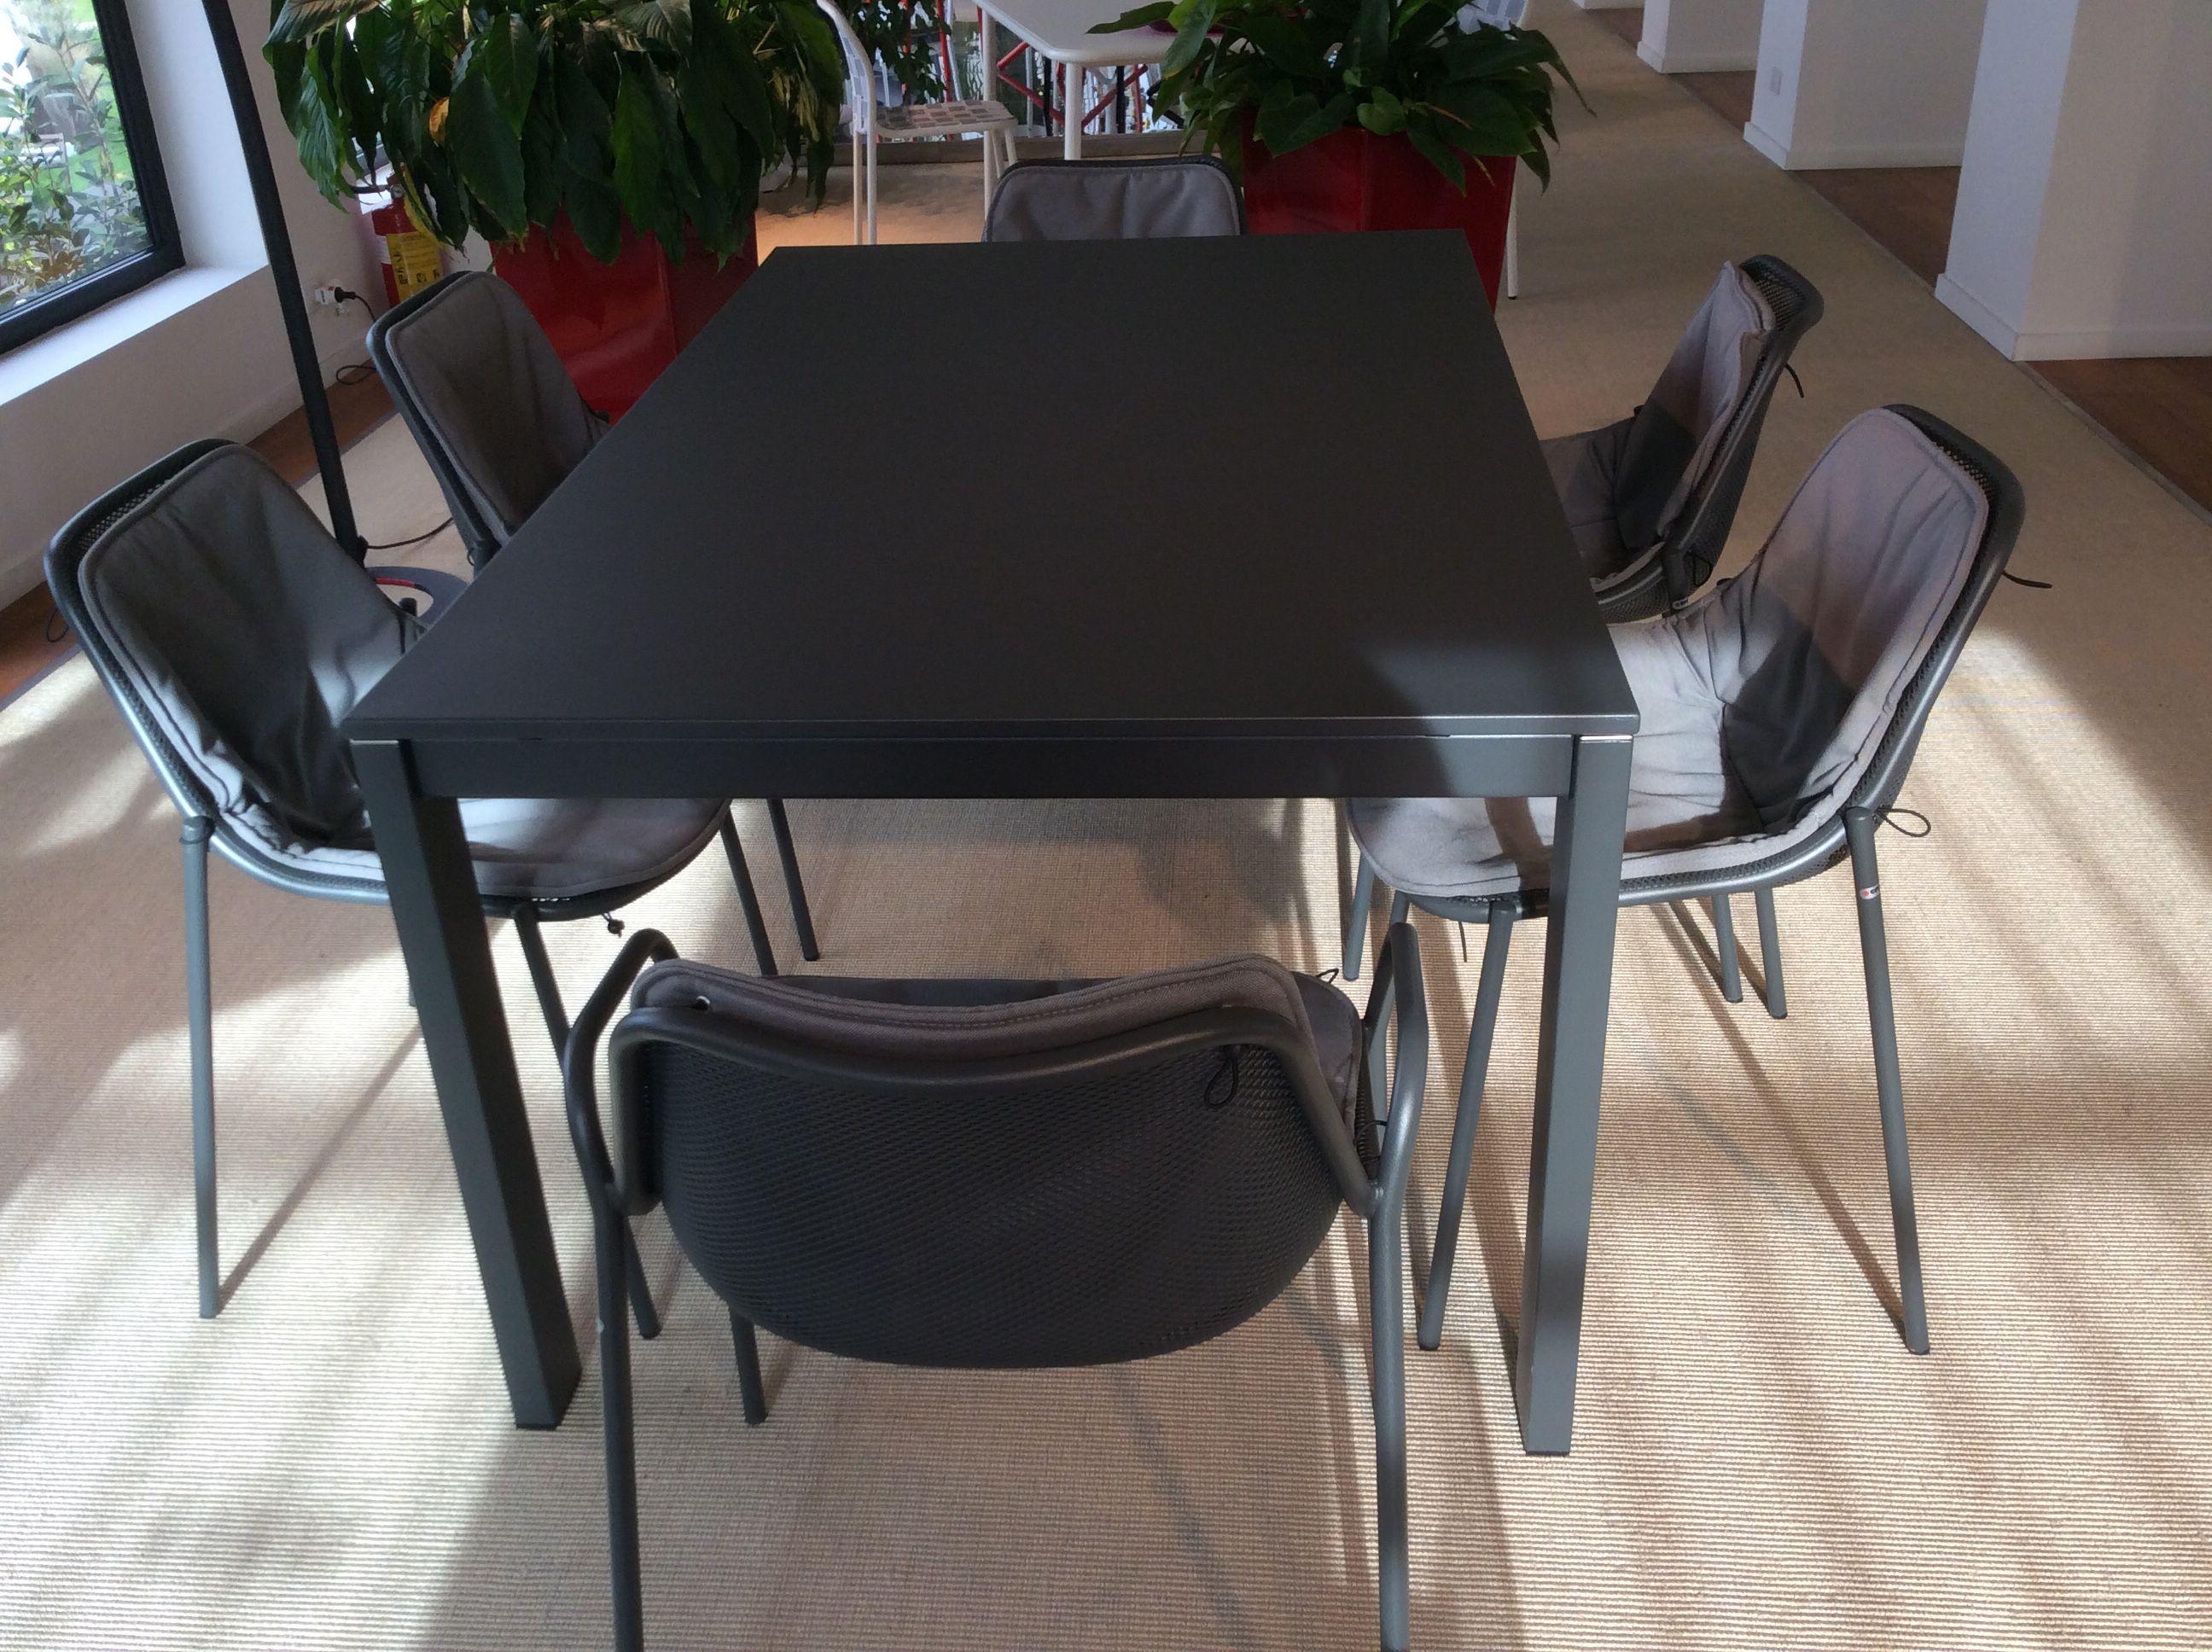 Tavolino Poggiapiedi ~ 29 best tavolini da salotto moderni in plexiglass images on